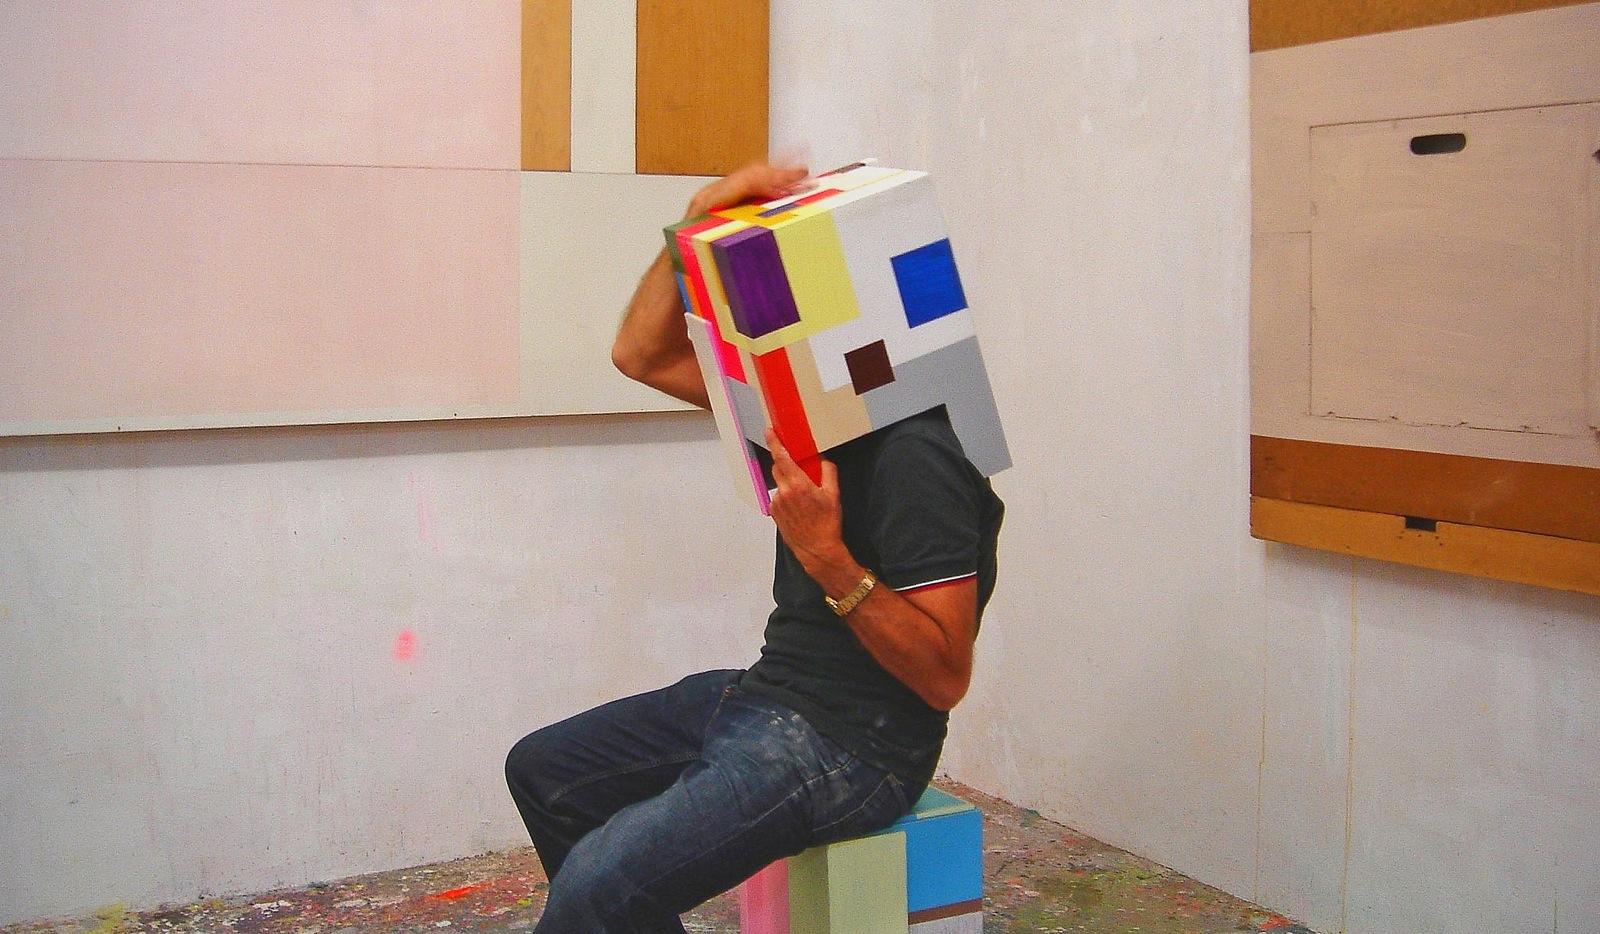 Incarnation, 2013